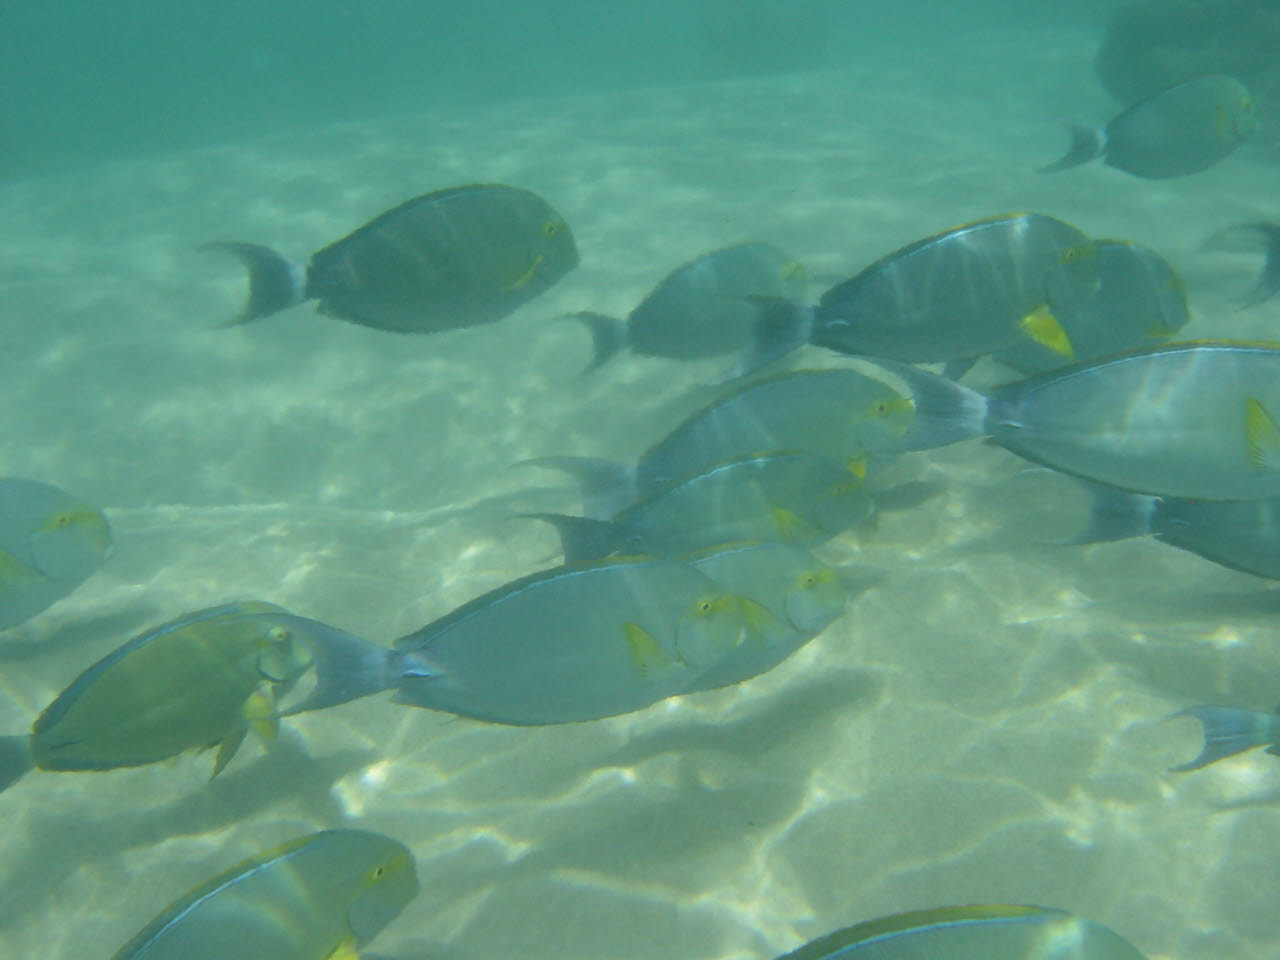 A flock of Yellowfin surgeonfish wallpaper